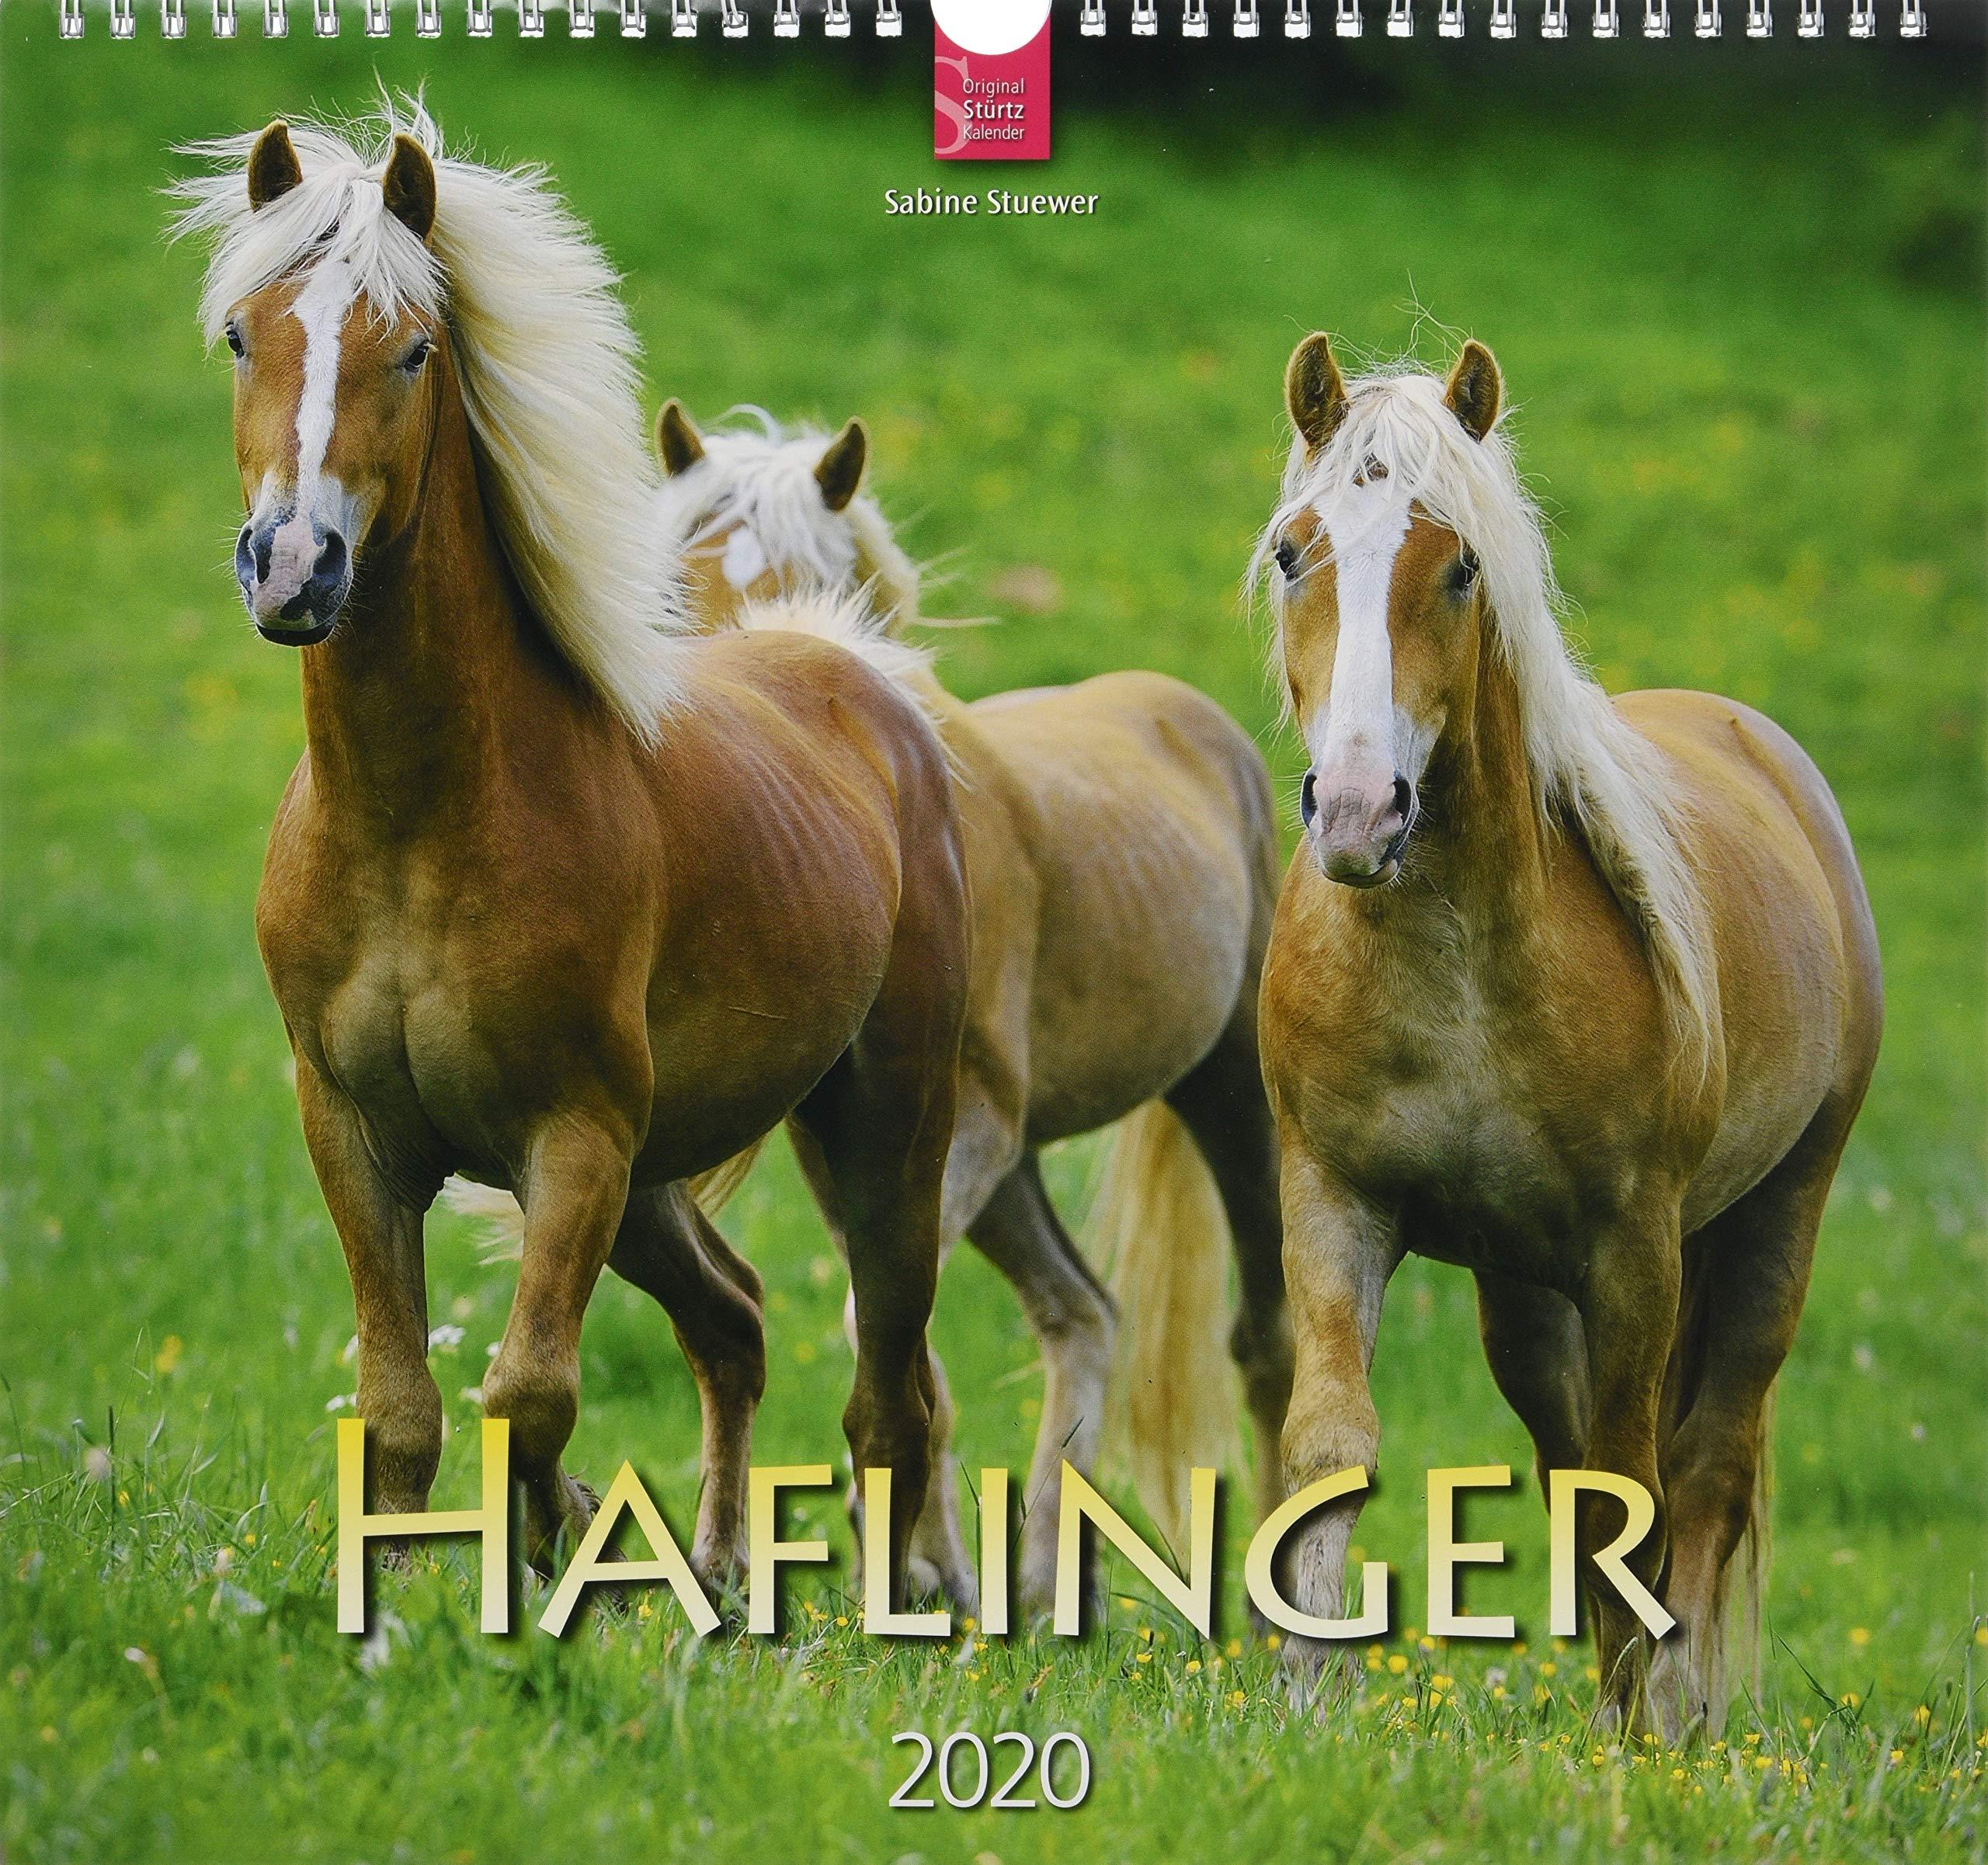 Haflinger  Original Stürtz Kalender 2020   Mittelformat Kalender 33 X 31 Cm